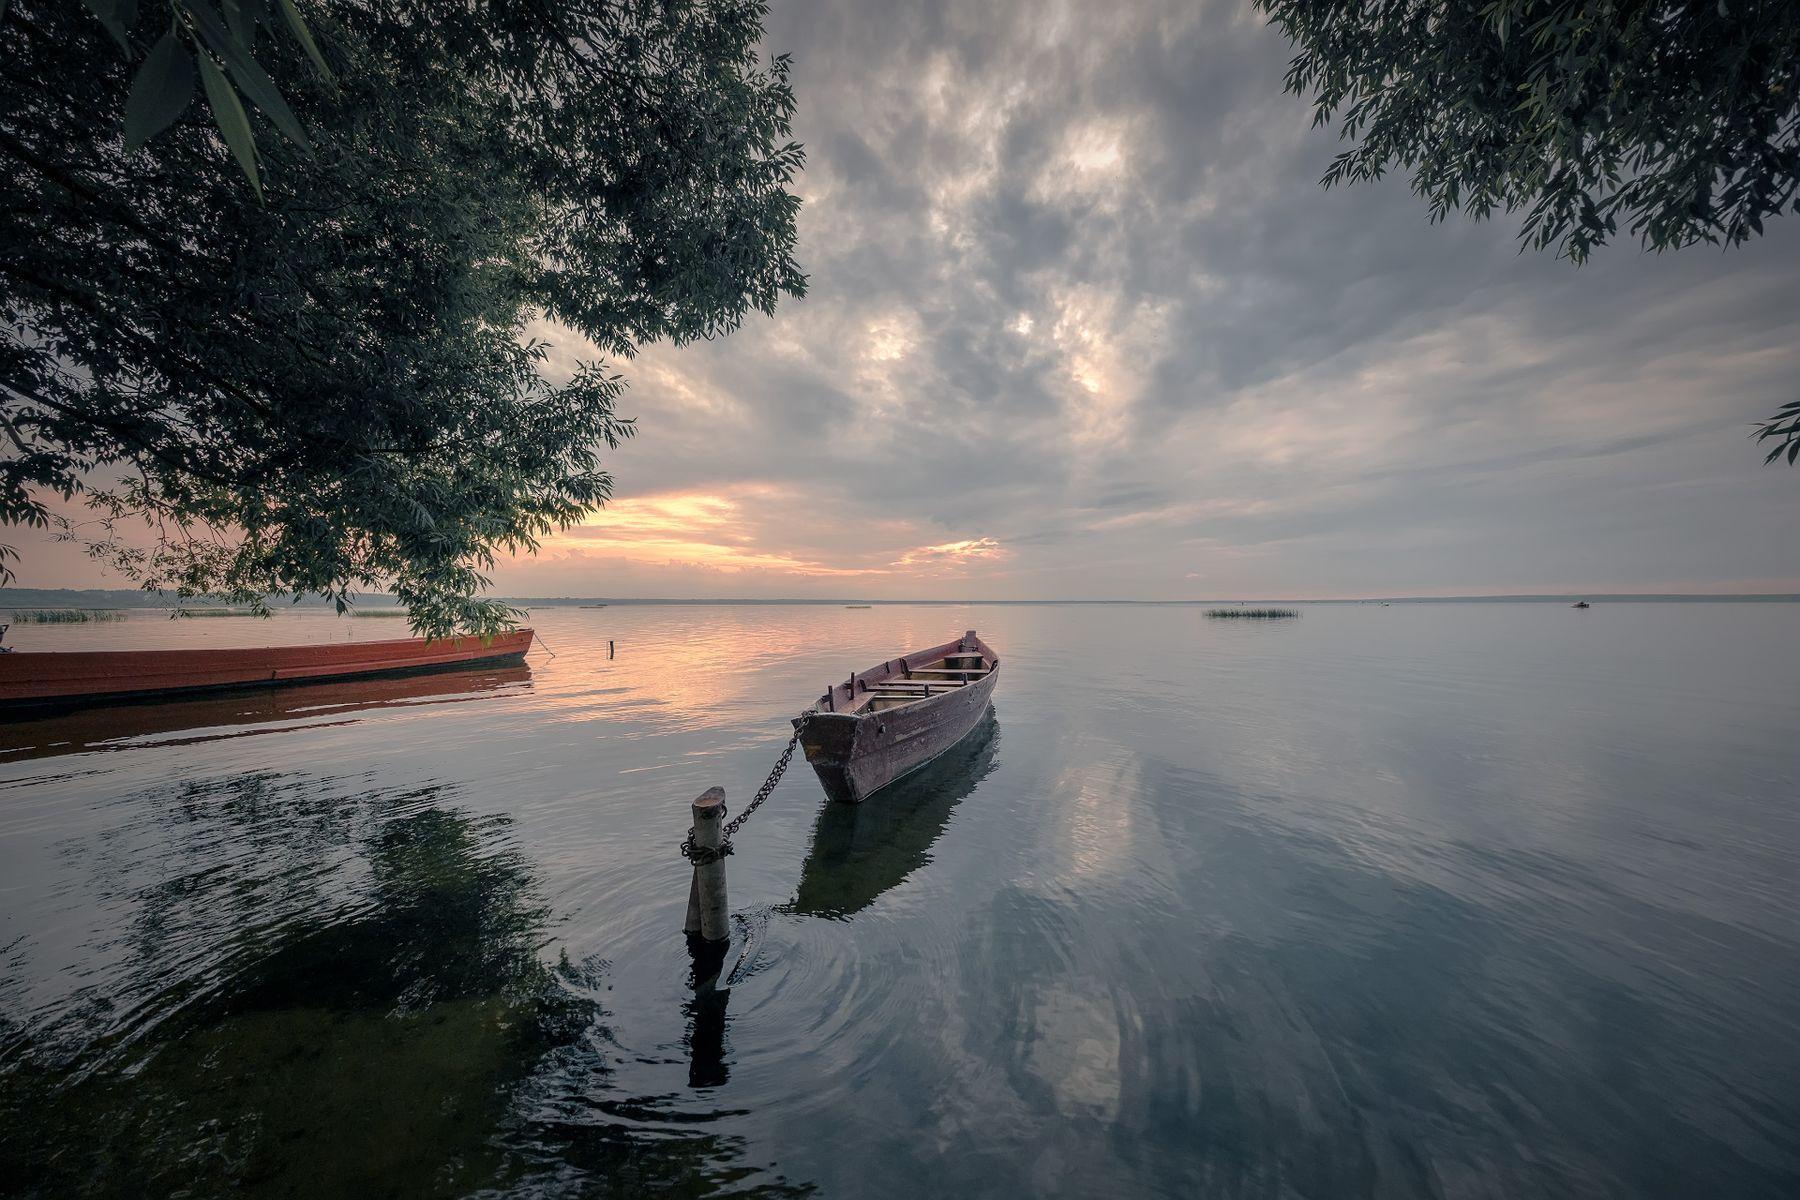 Лодки на закате озеро лодки закат деревья облака пейзаж природа переславль плещеево